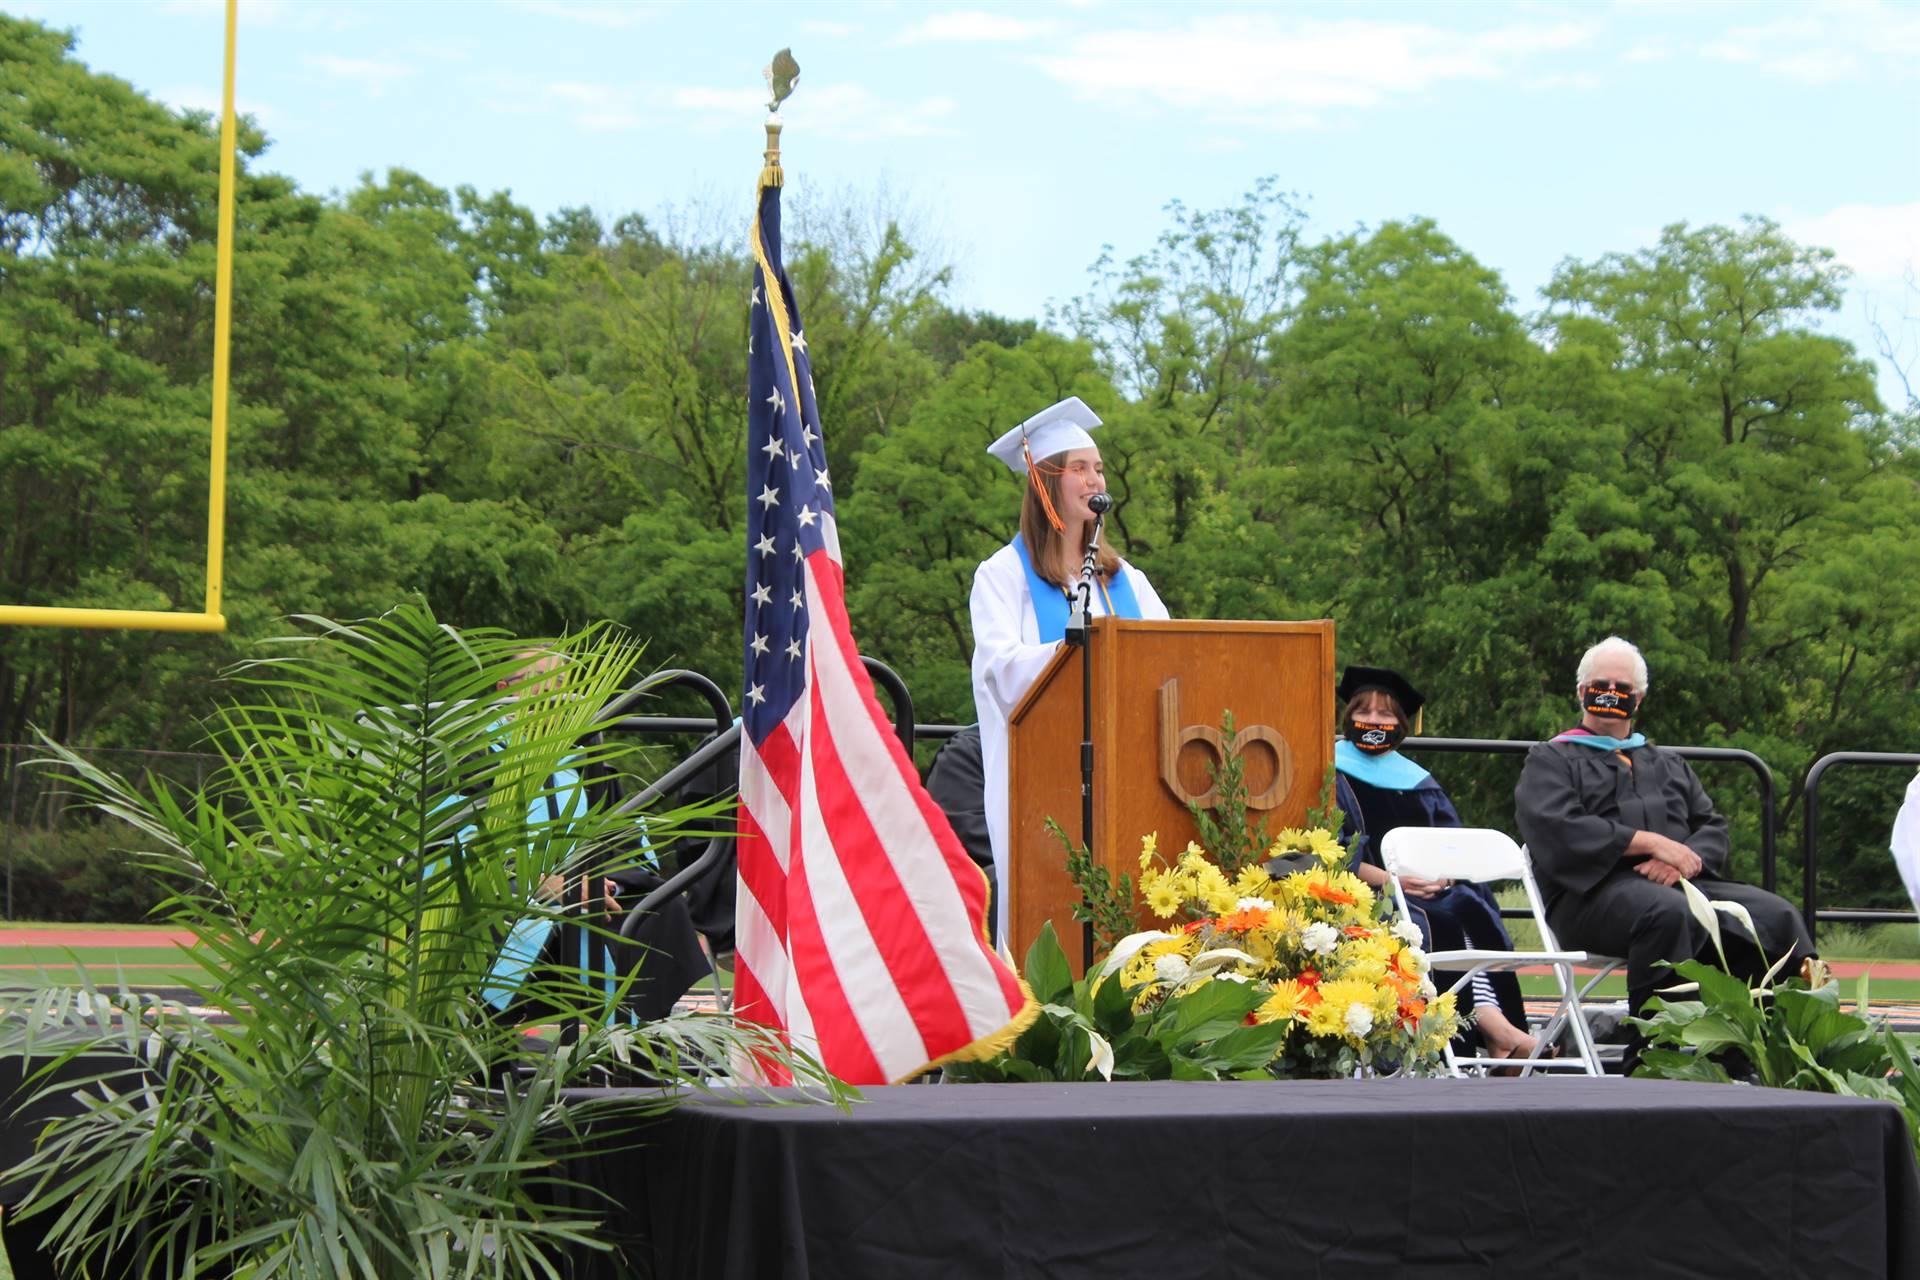 Senior Class President Address